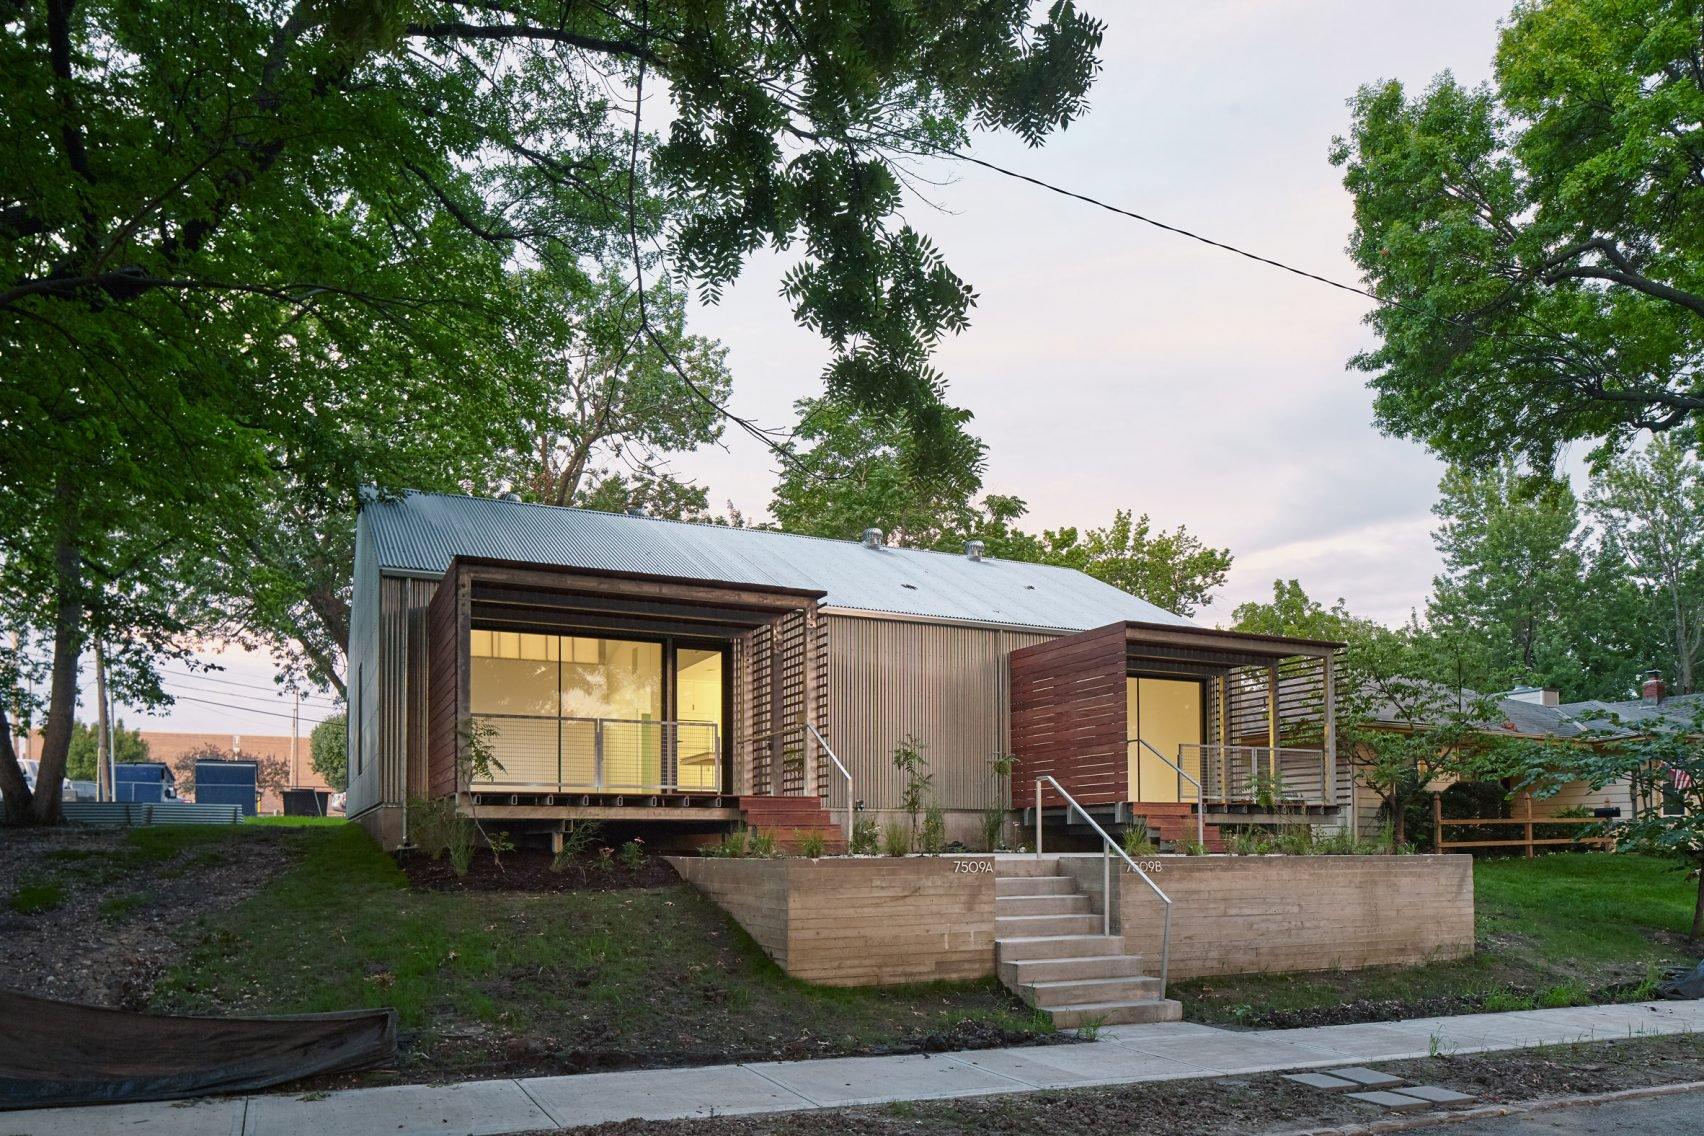 Architecture students build modern duplex for low income for Cheap duplex plans